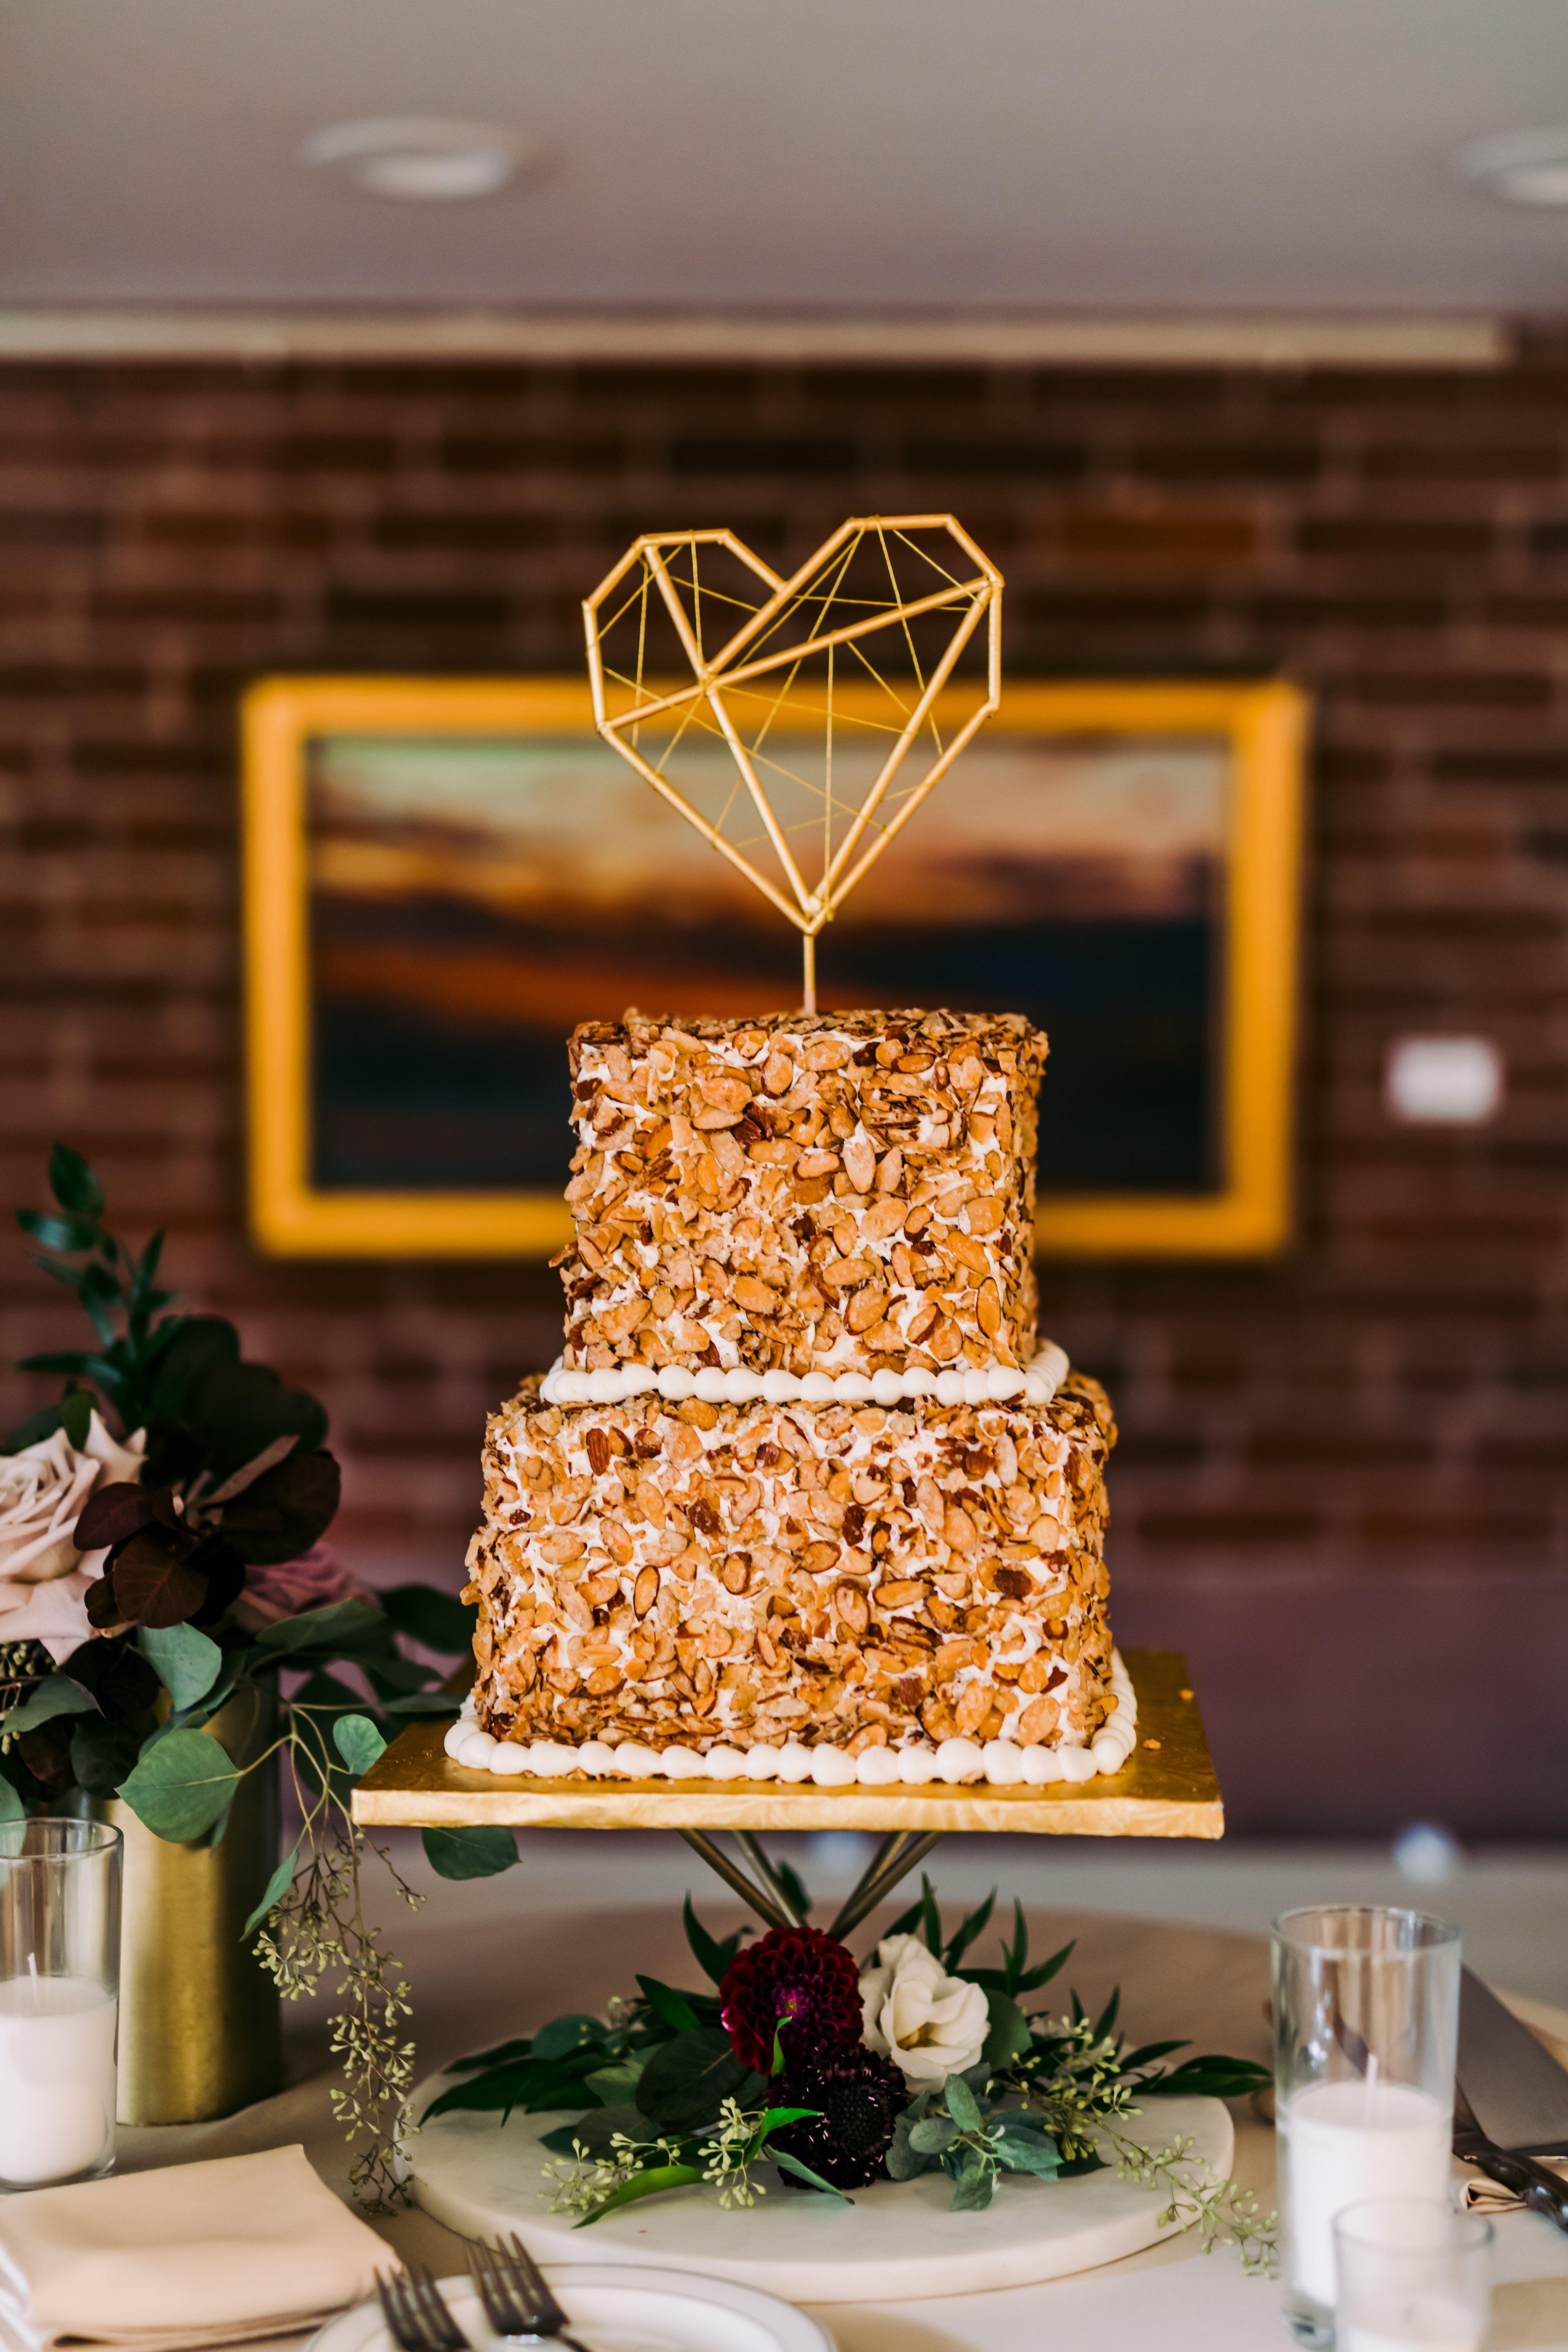 Almond wedding cake krystal healy photography almond